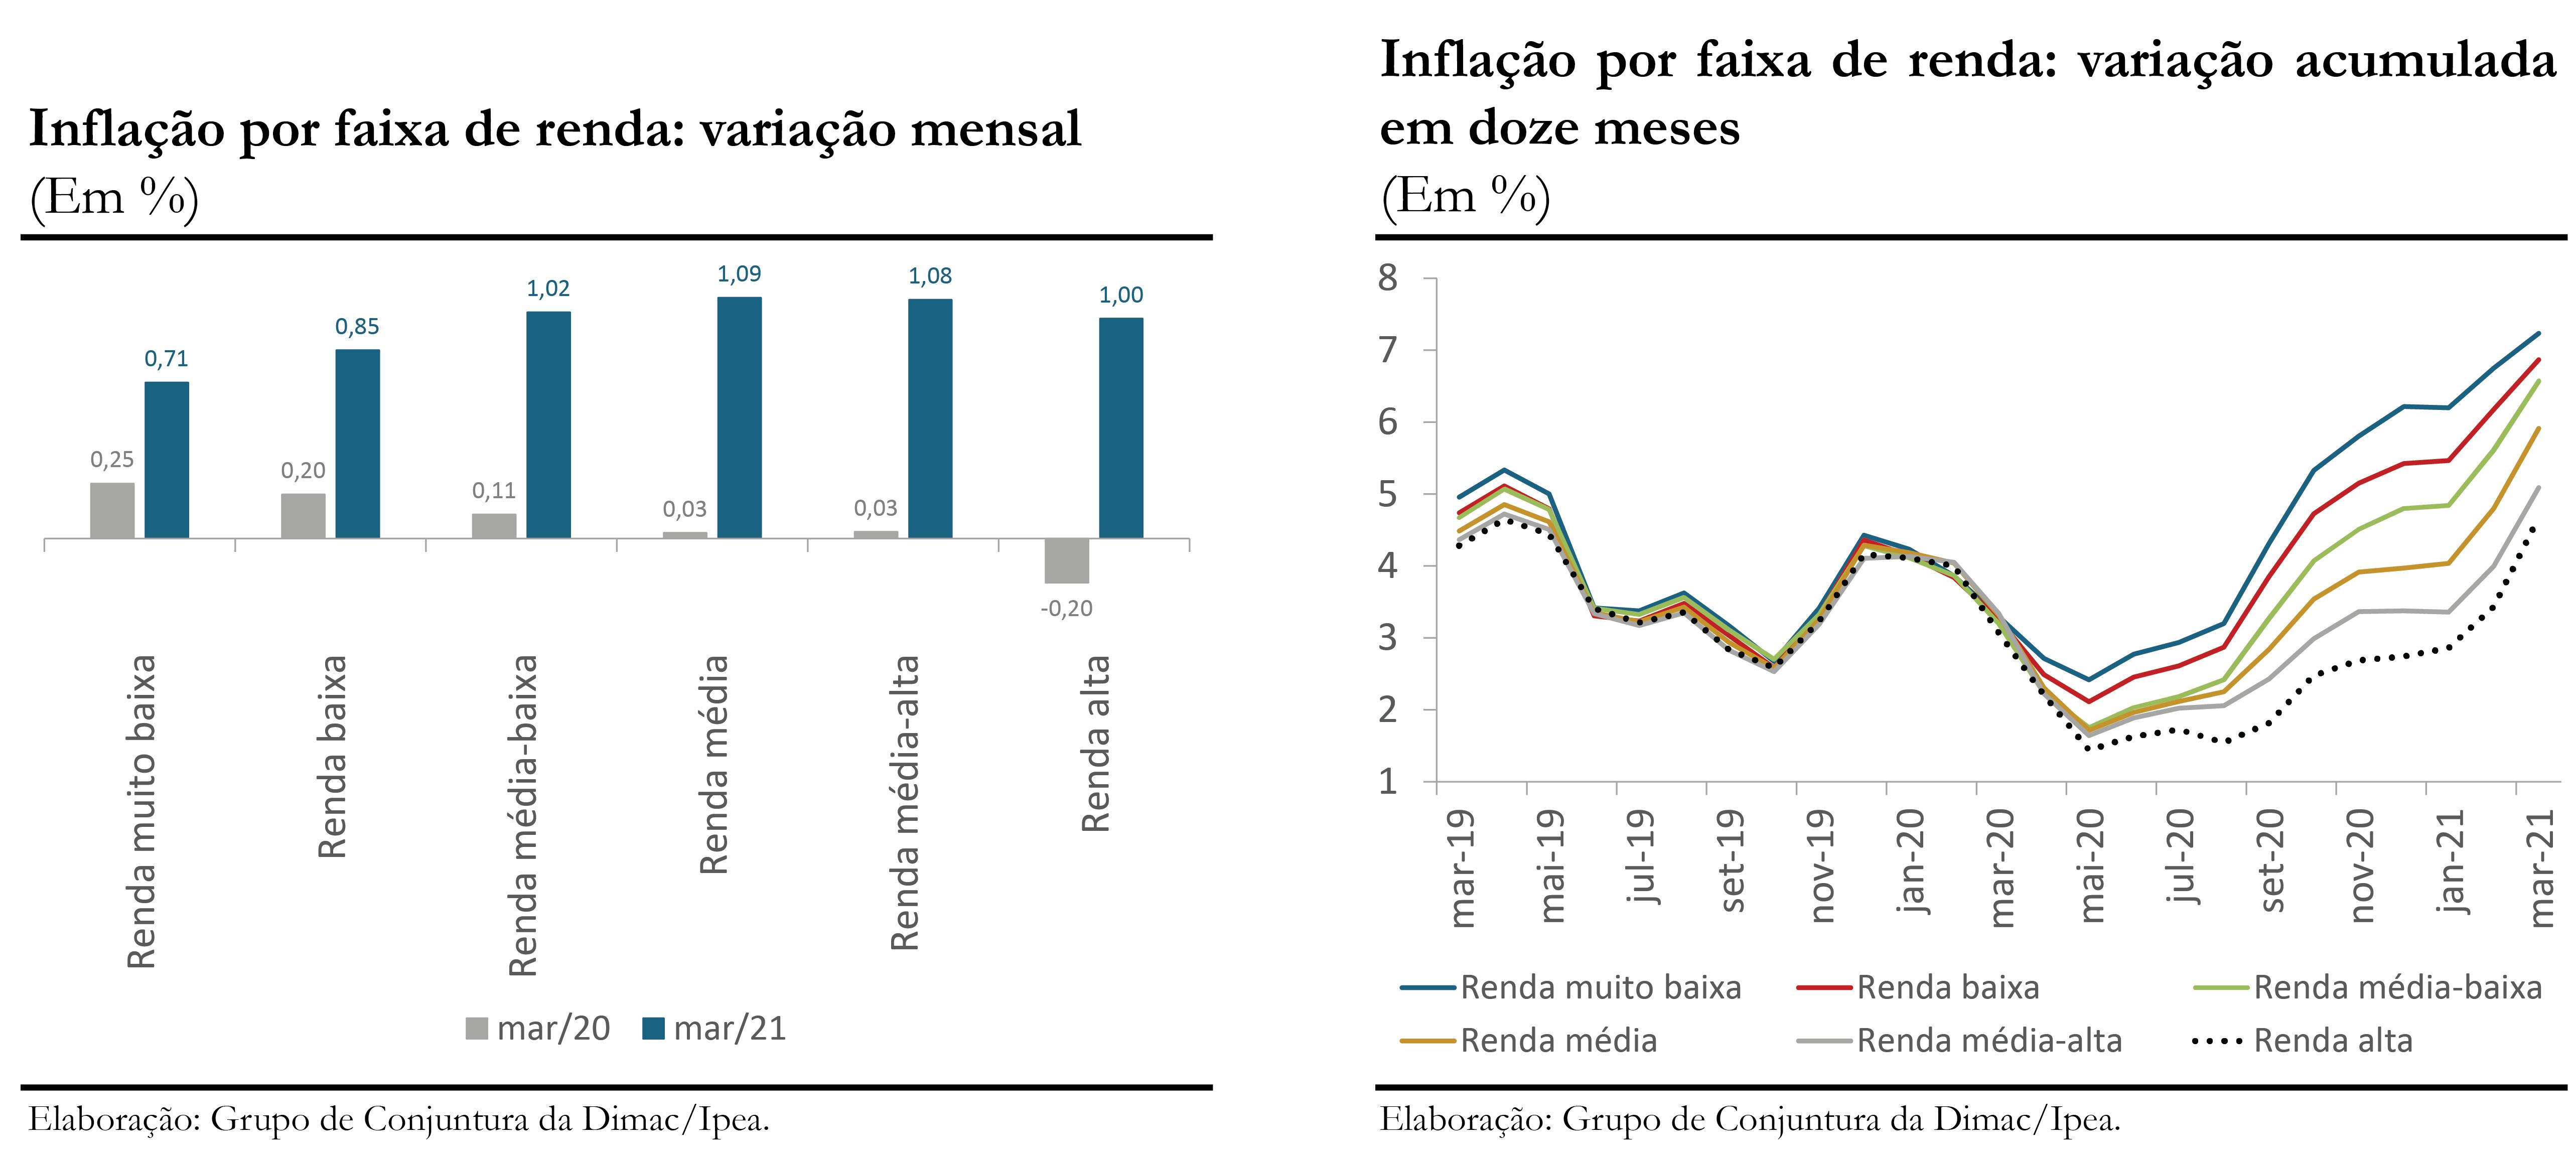 210413_cc_51_nota_5_inflacao_faixa_de_renda_graficos_1_e_2_mar_21